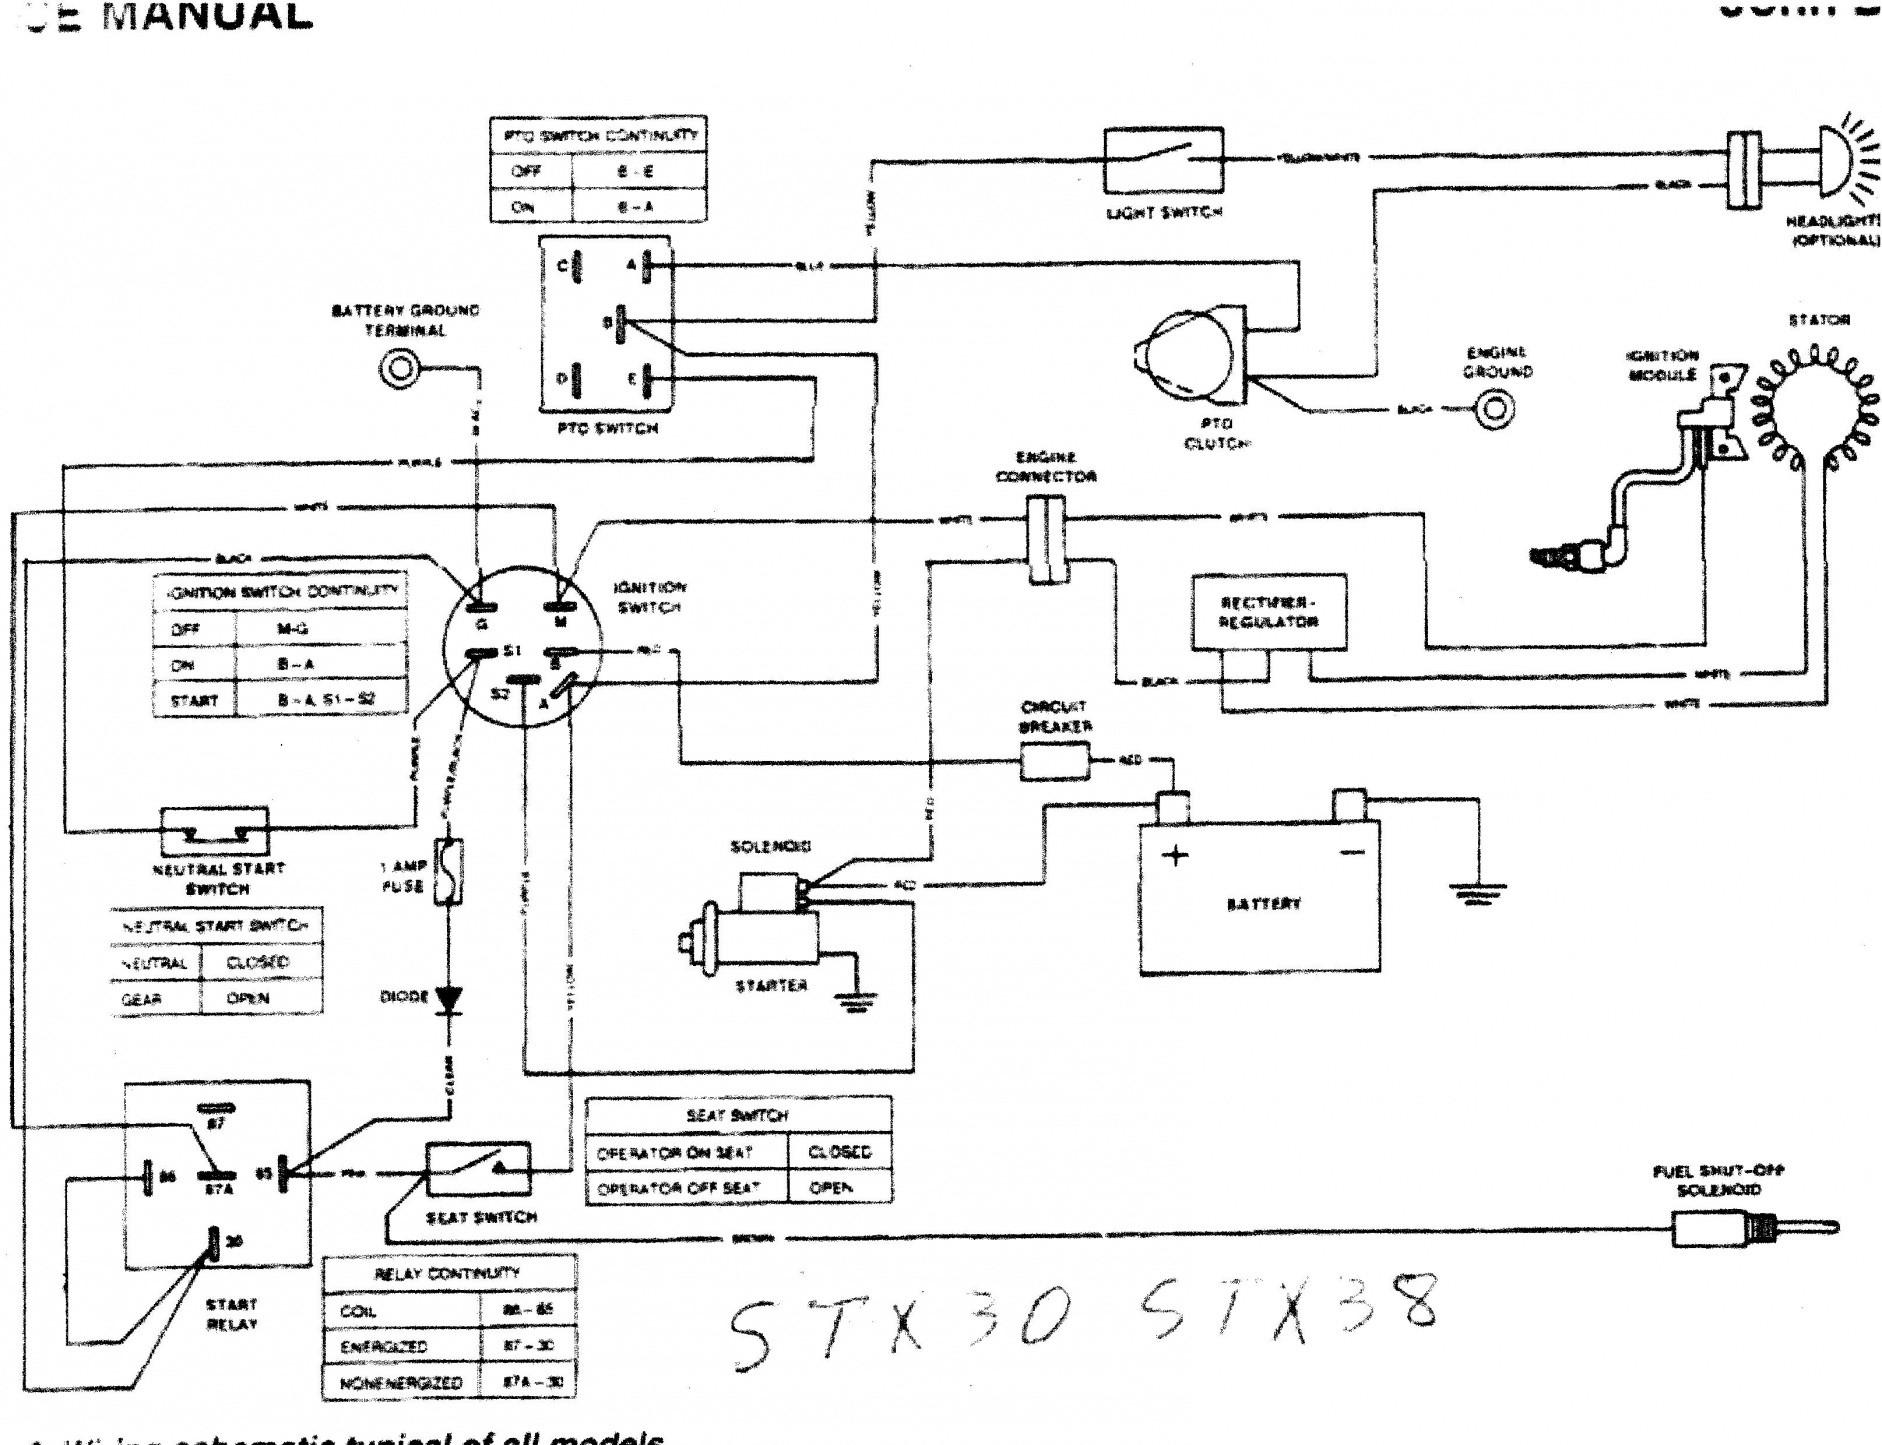 hight resolution of jd 2520 wiring diagram blog wiring diagram jd 2520 wiring diagram source john deere